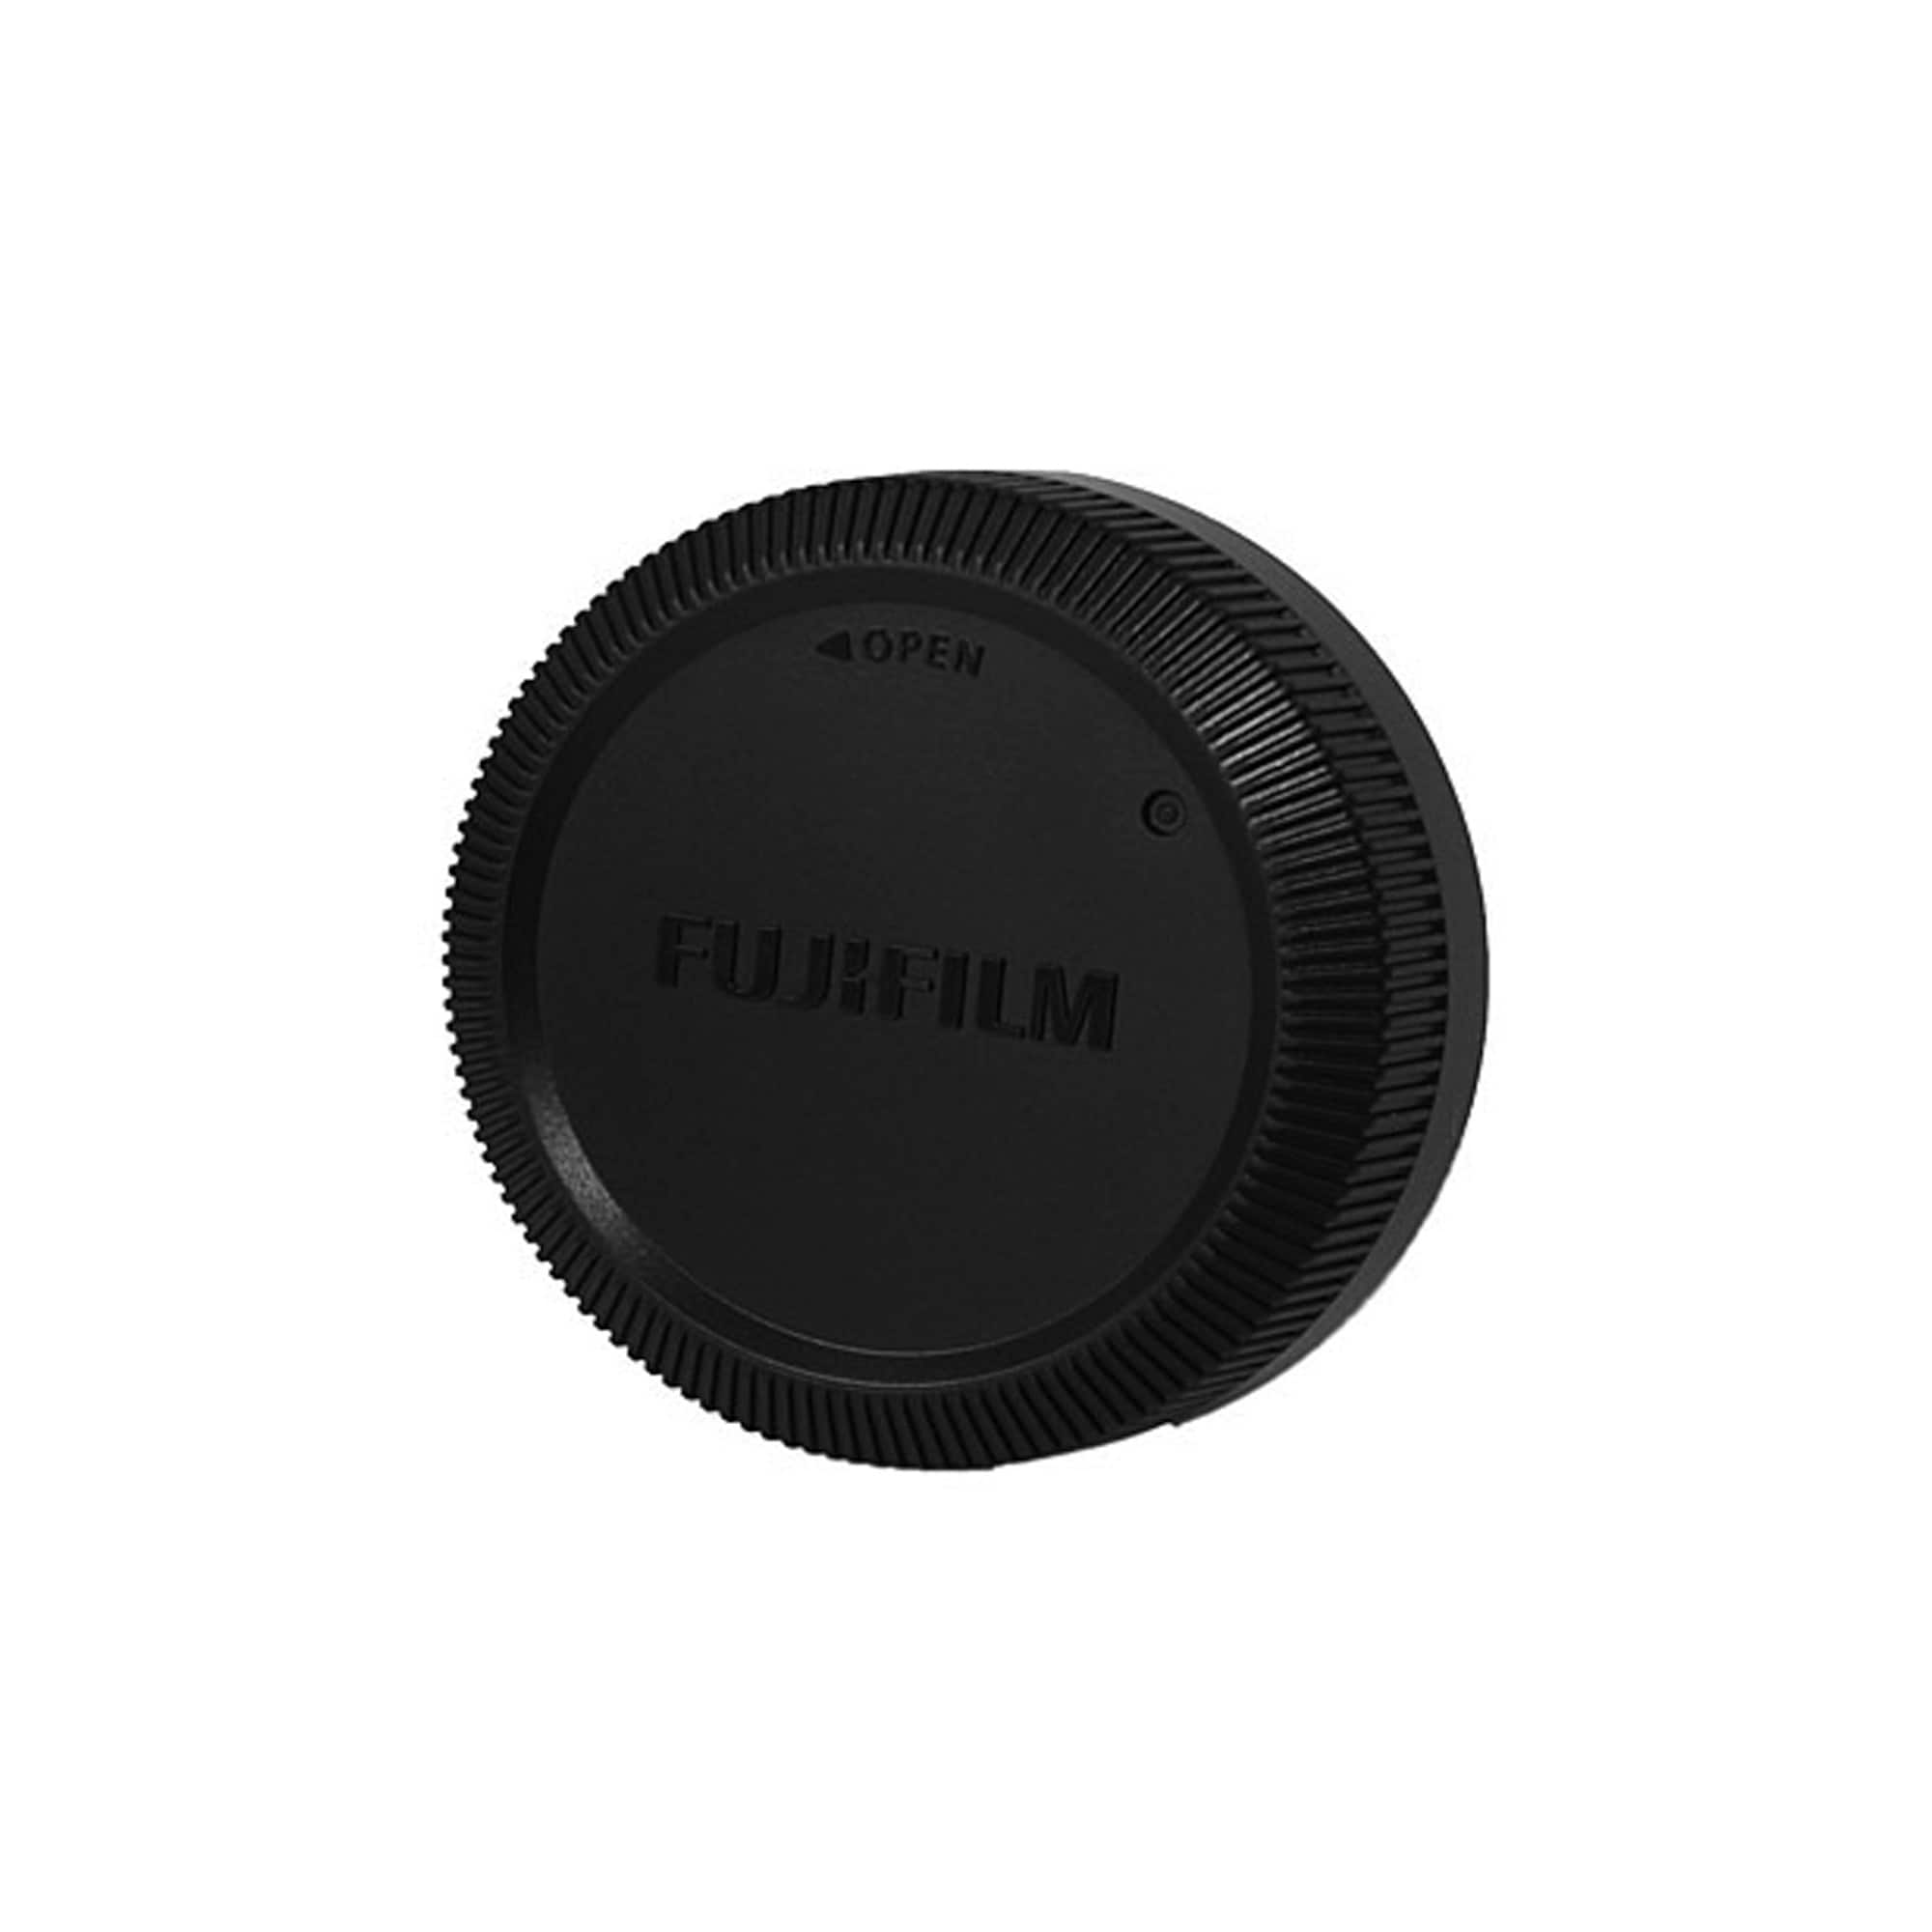 Fujifilm XF/XC Rear Lens Cap